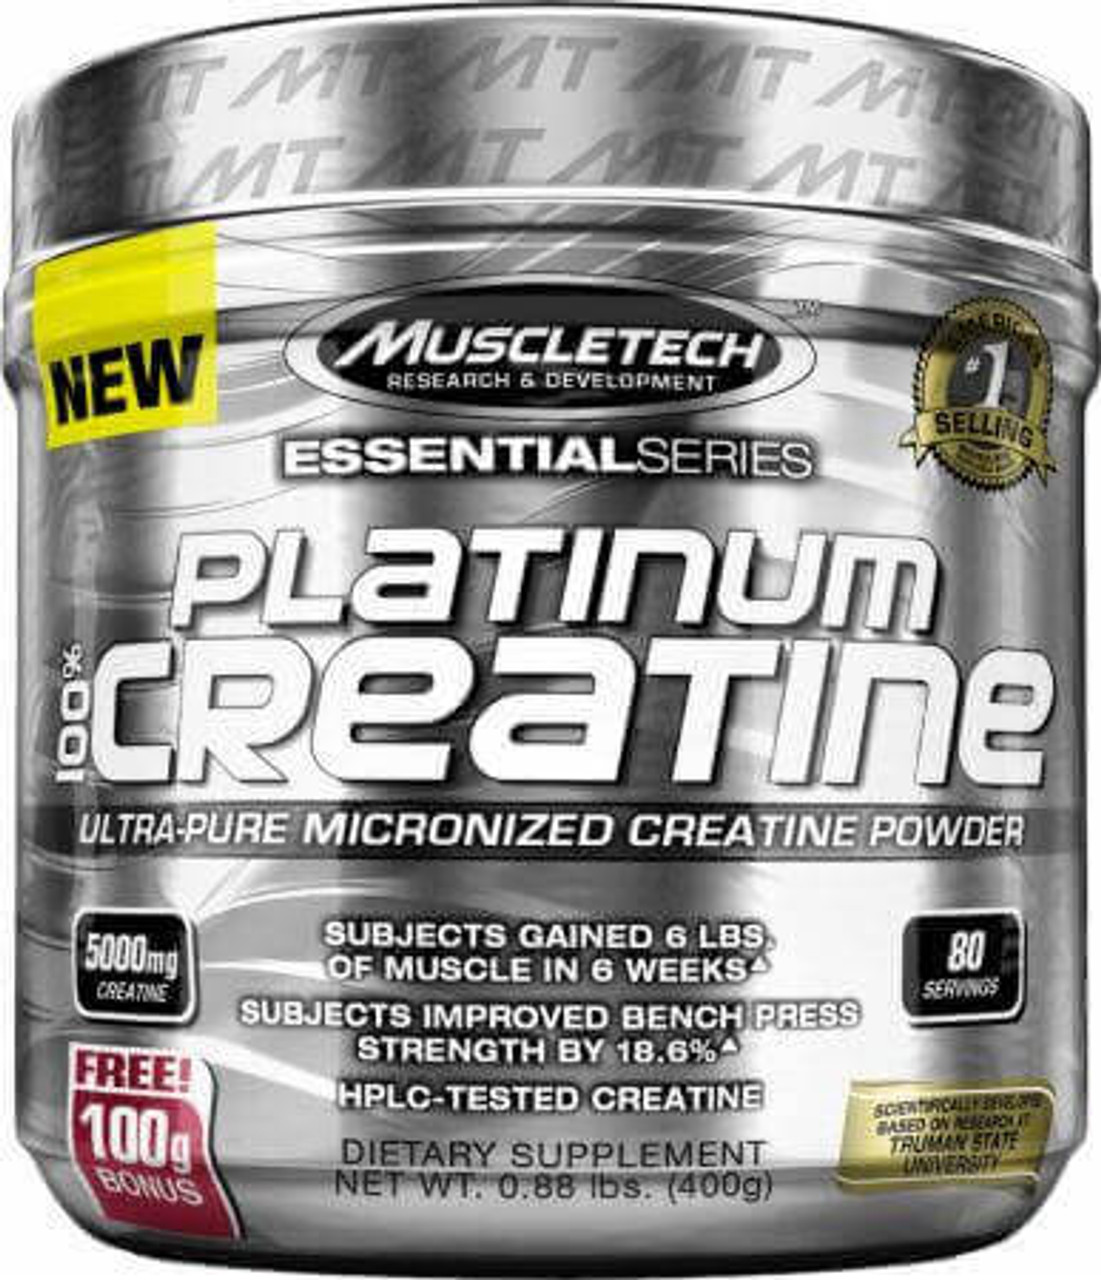 Platinum Creatine 80sv MuscleTech